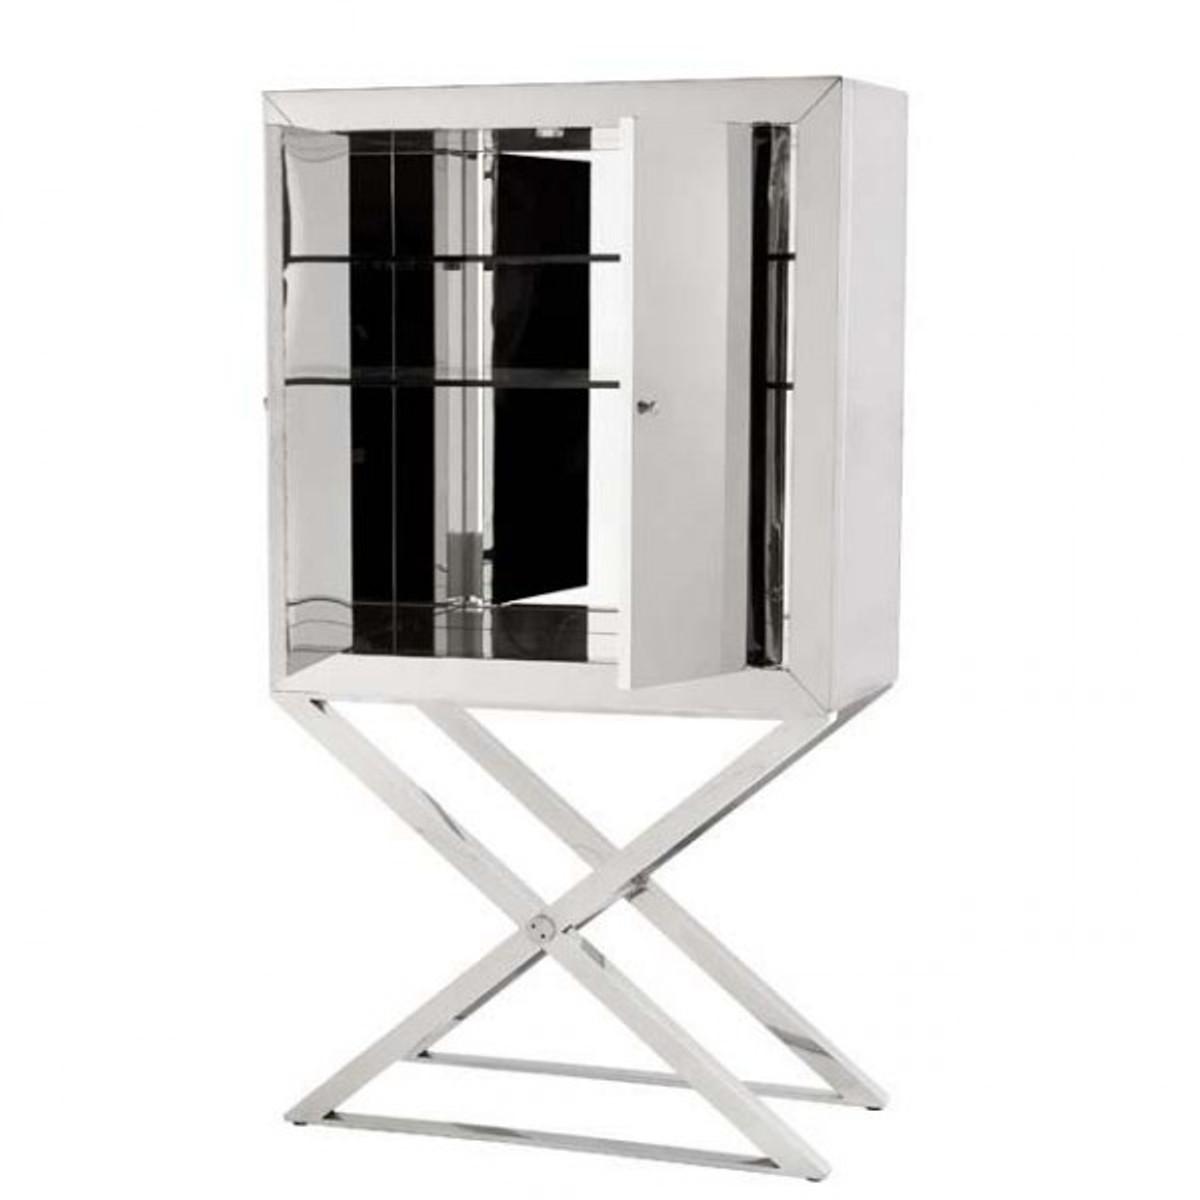 casa padrino luxus designer barschrank edelstahl verspiegelt luxus hotel m bel spiegel m bel. Black Bedroom Furniture Sets. Home Design Ideas